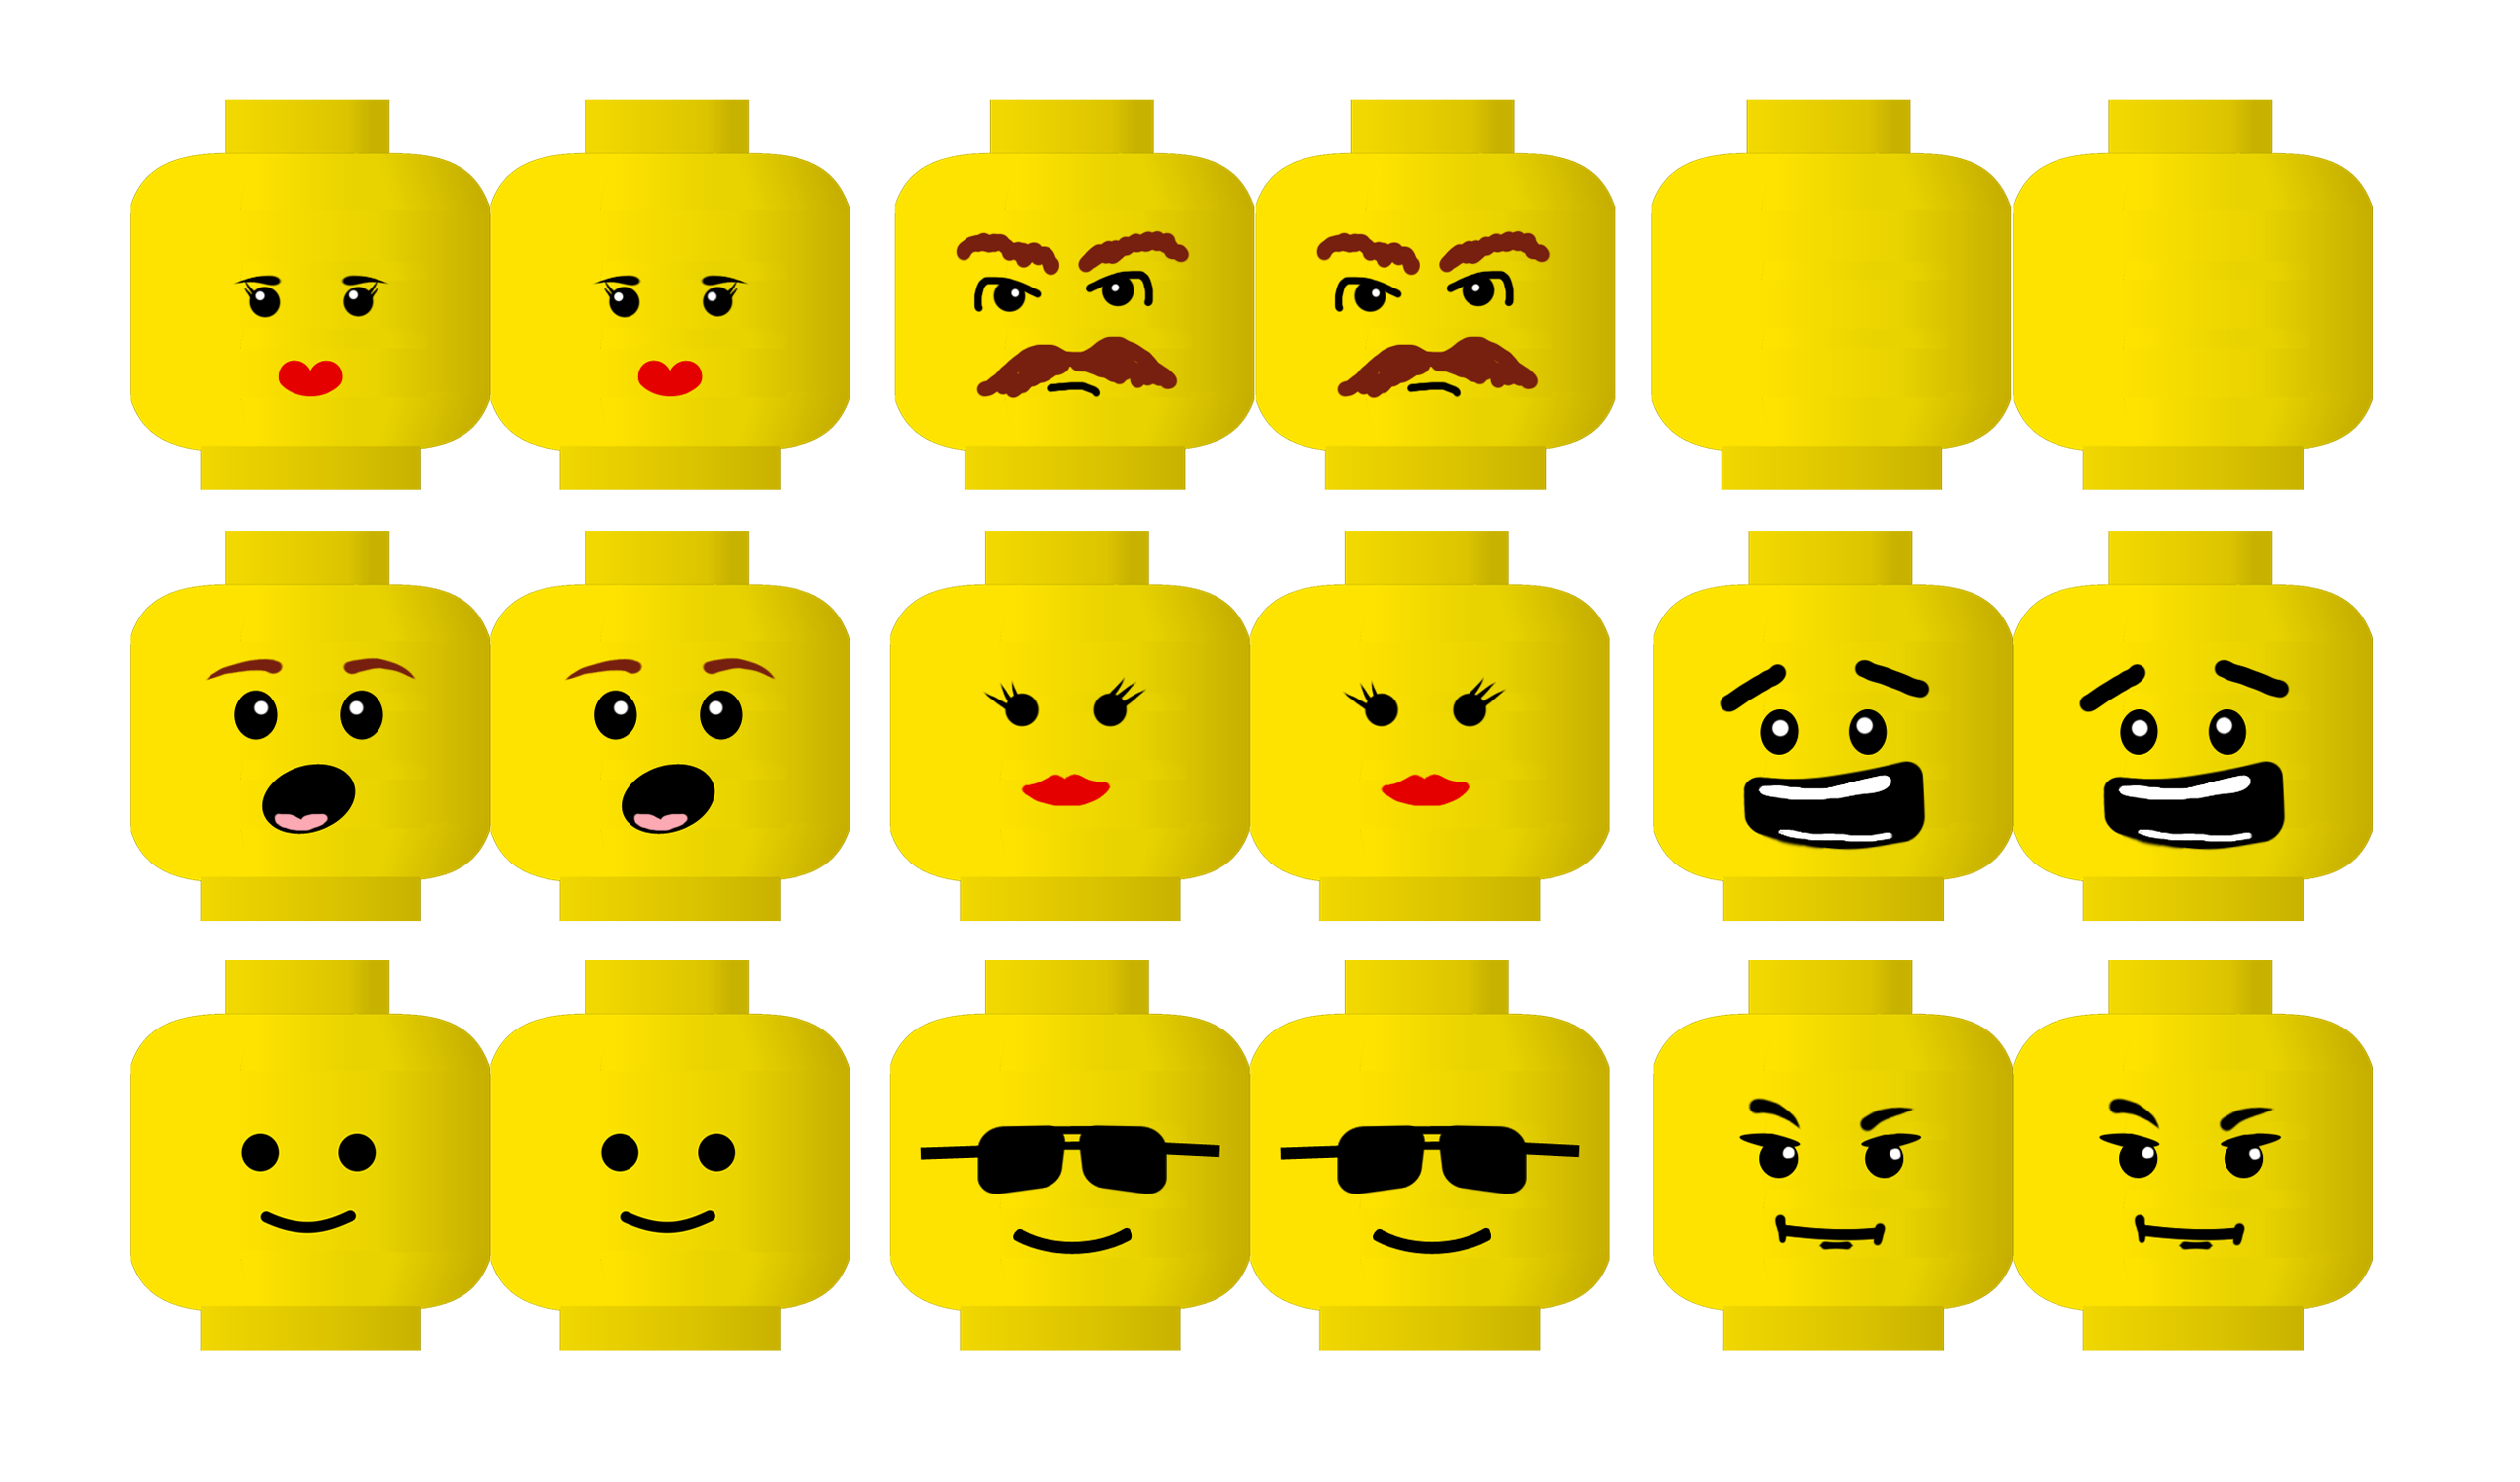 photo relating to Lego Head Printable identify lego minifigure brain printable - Google Glimpse Shade my